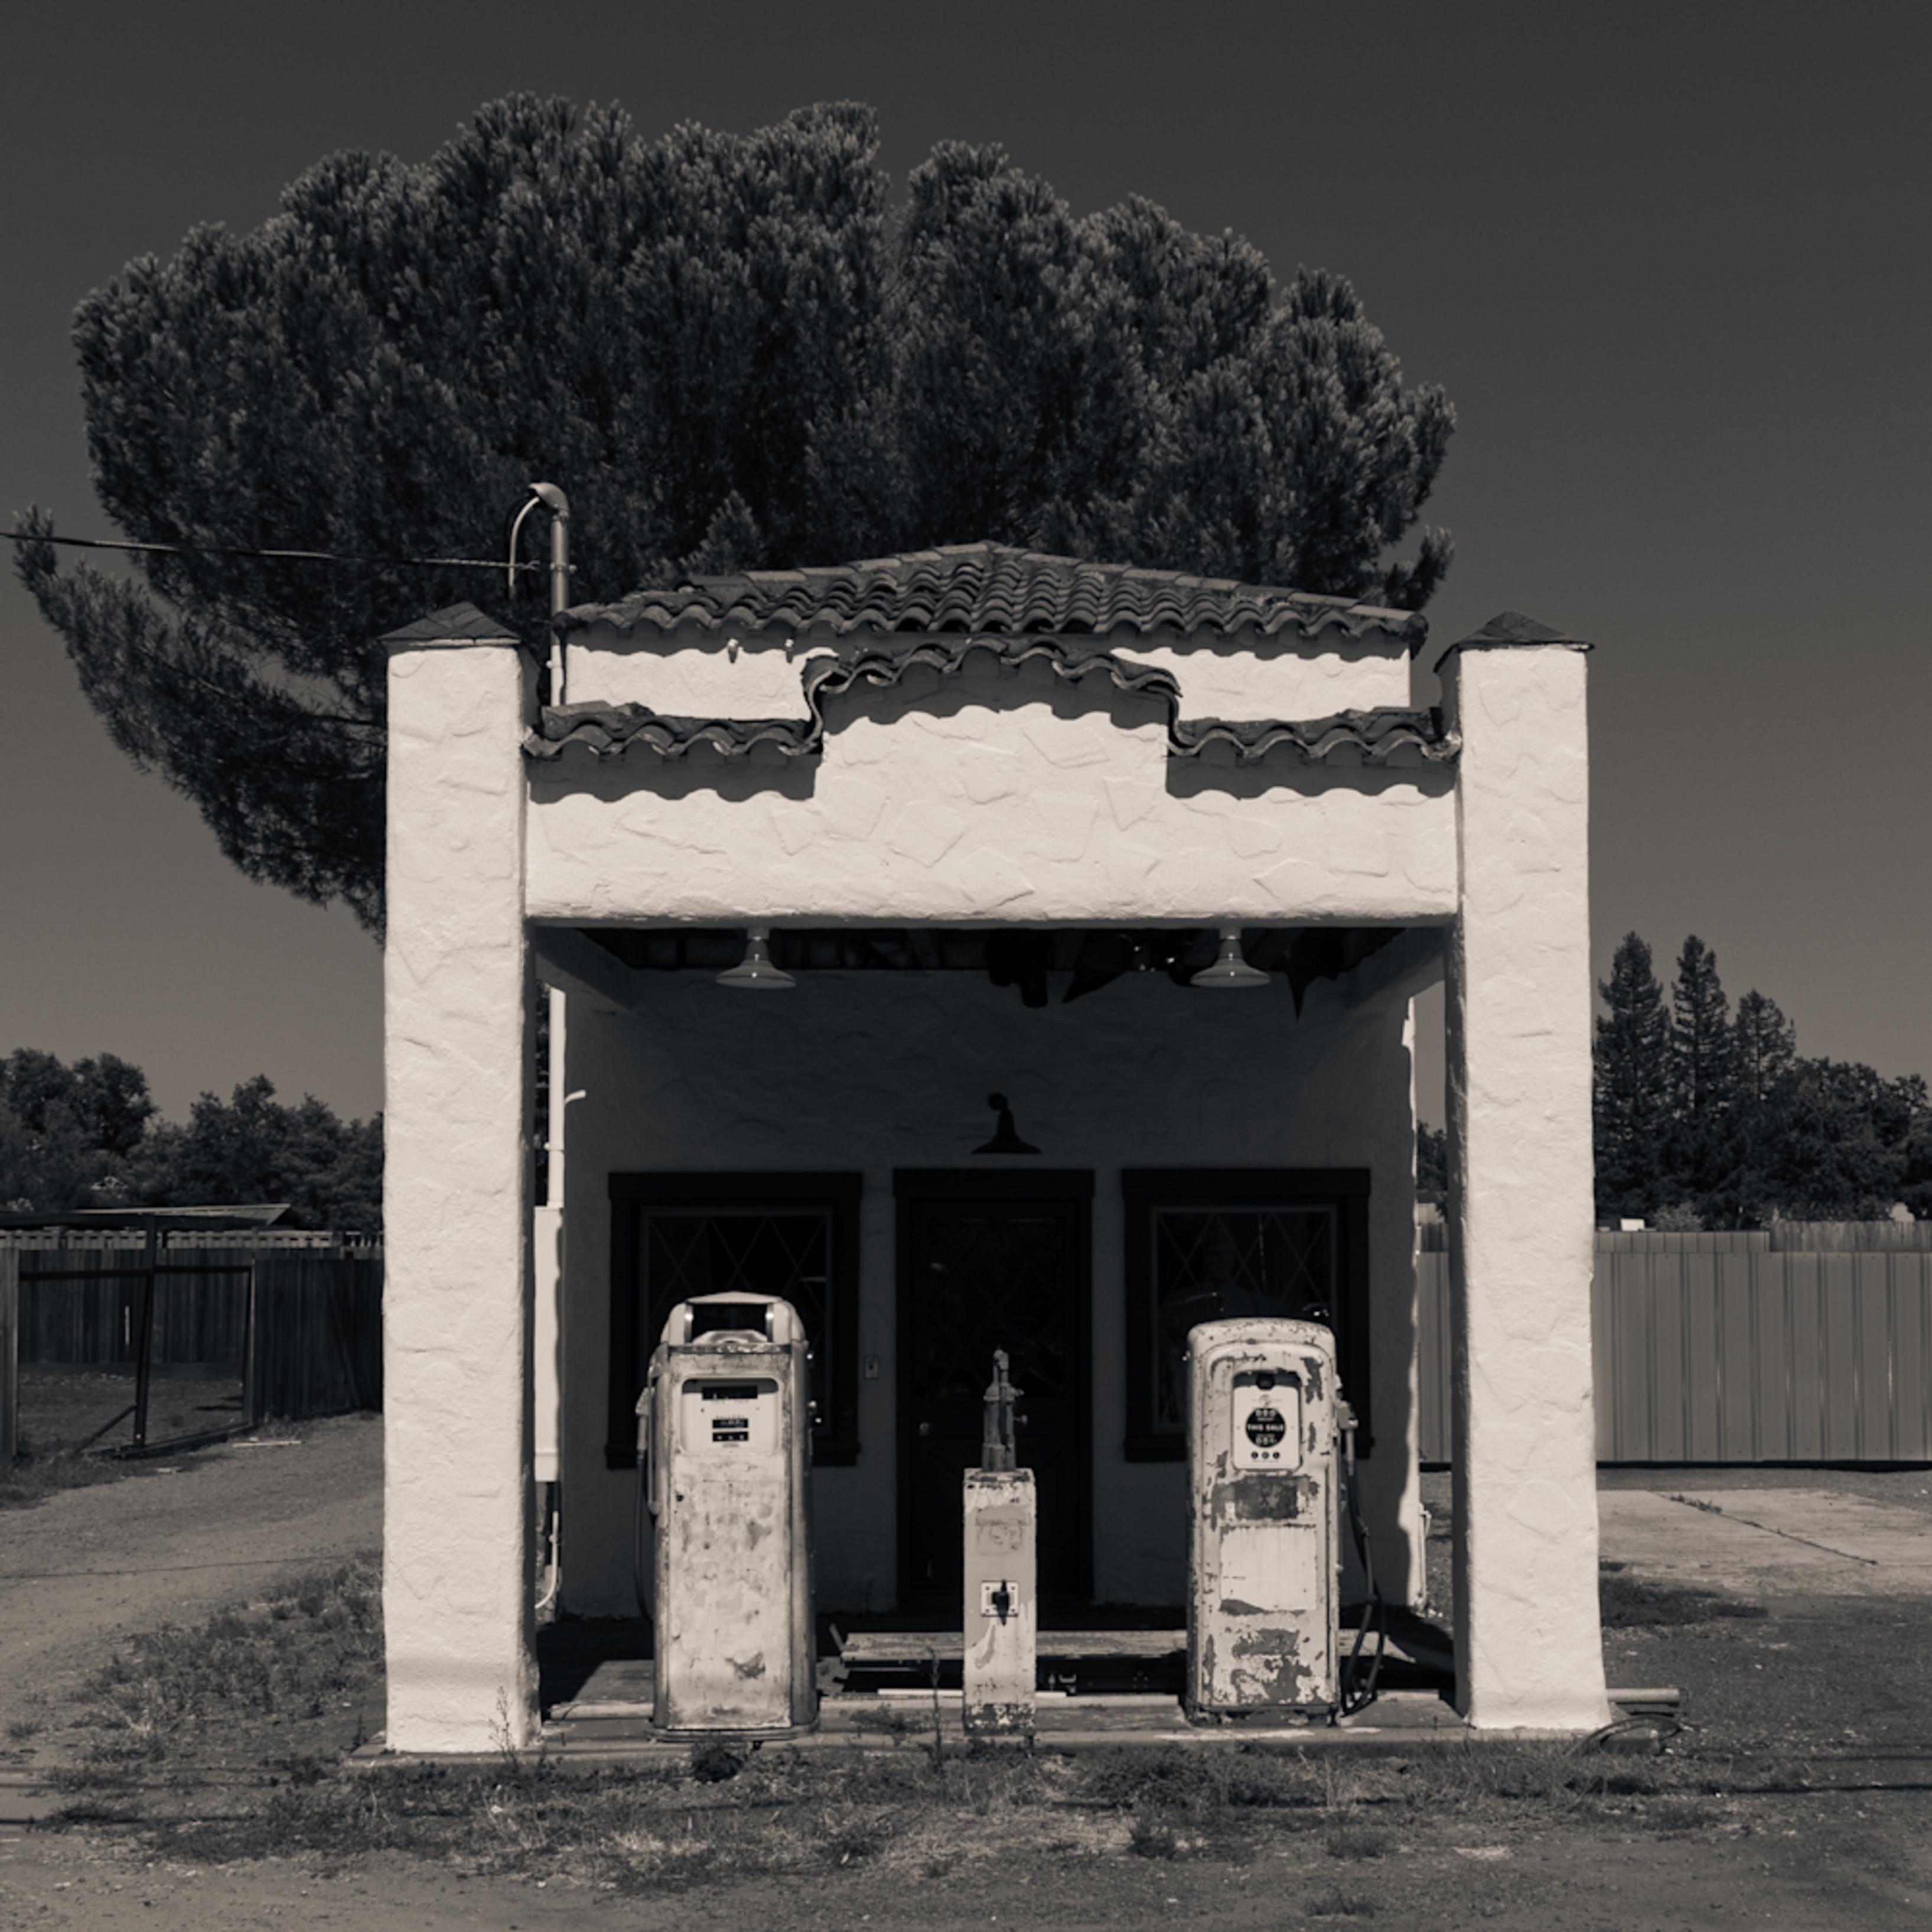 Ancient service station windsor ca jrwdne